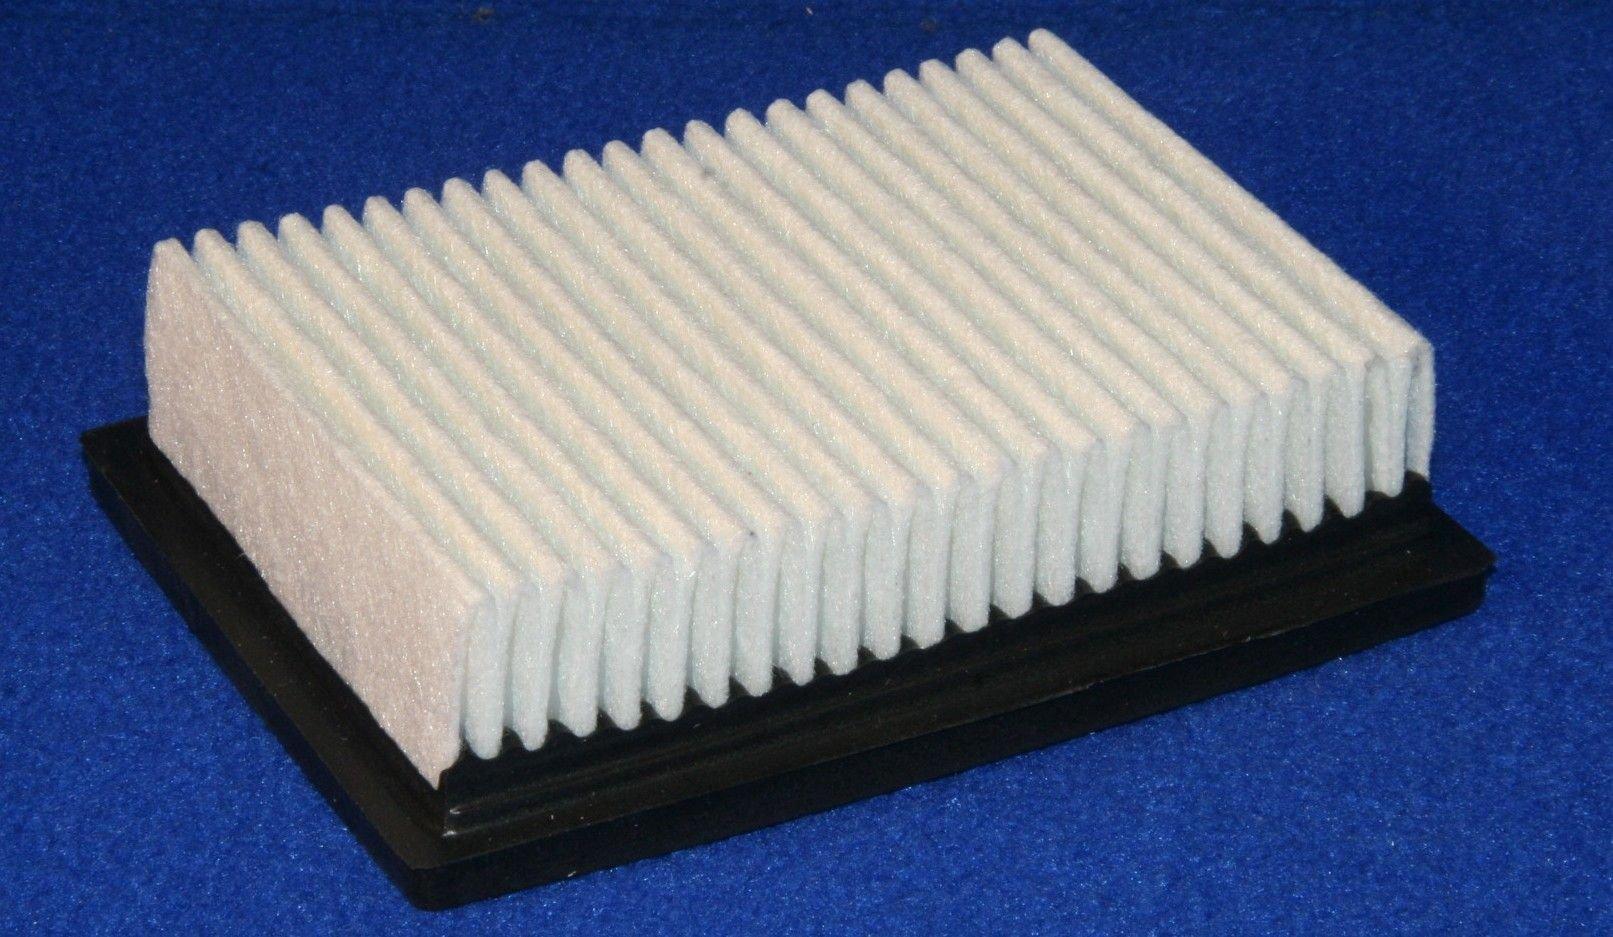 10 Each Vacuum Filter 1037821 Fits Tennant 5680, 5700, R14, & T12